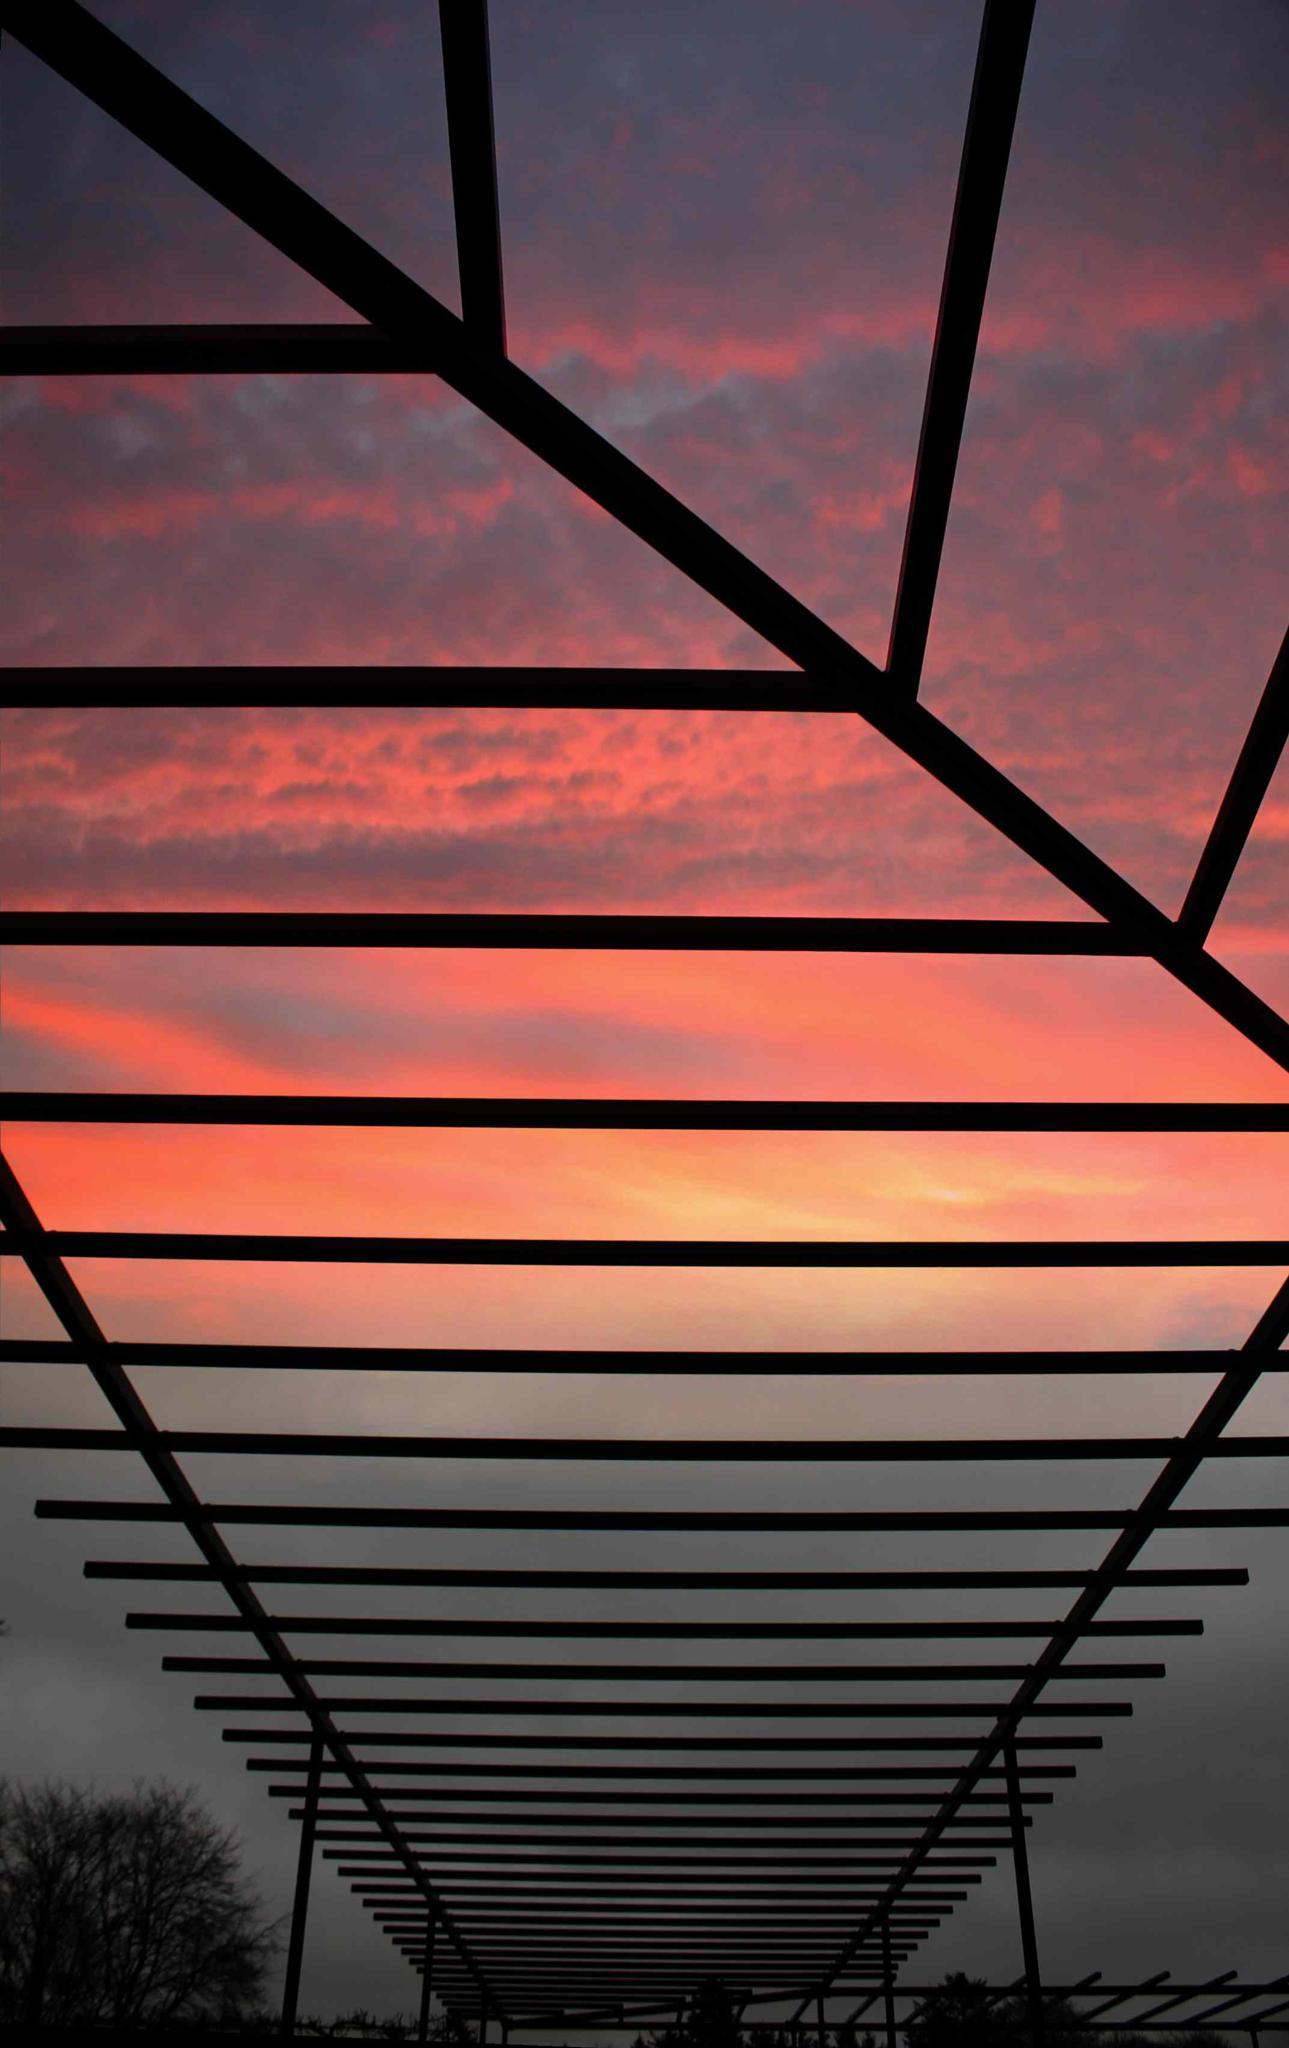 51 Sky through trellis by Steve Walsh ( Laird of Dunans )